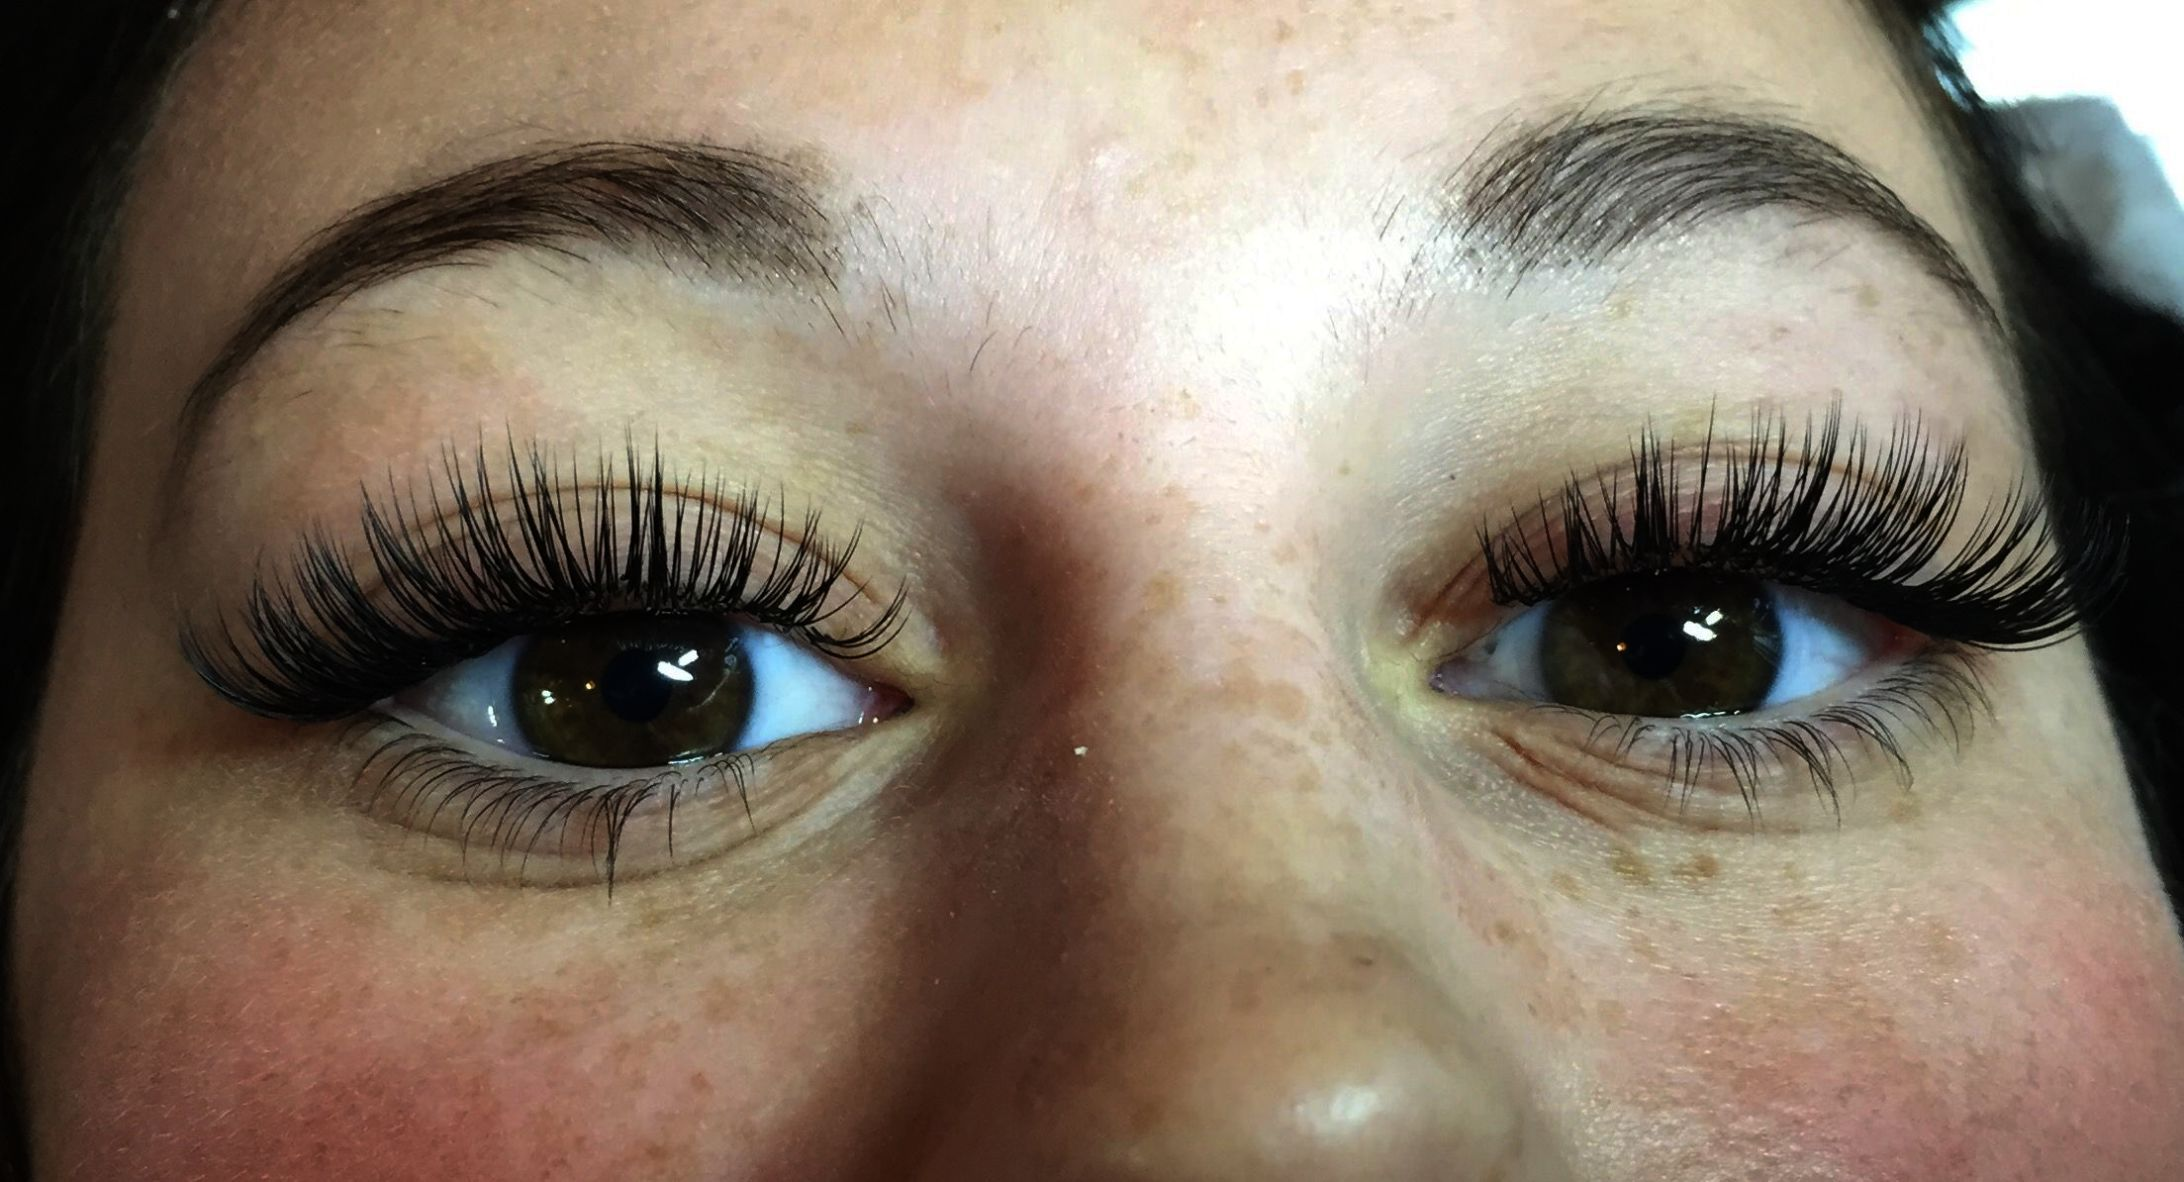 Shu Uemura S Curl Eyelash Curler (With images)   Eyelash ...